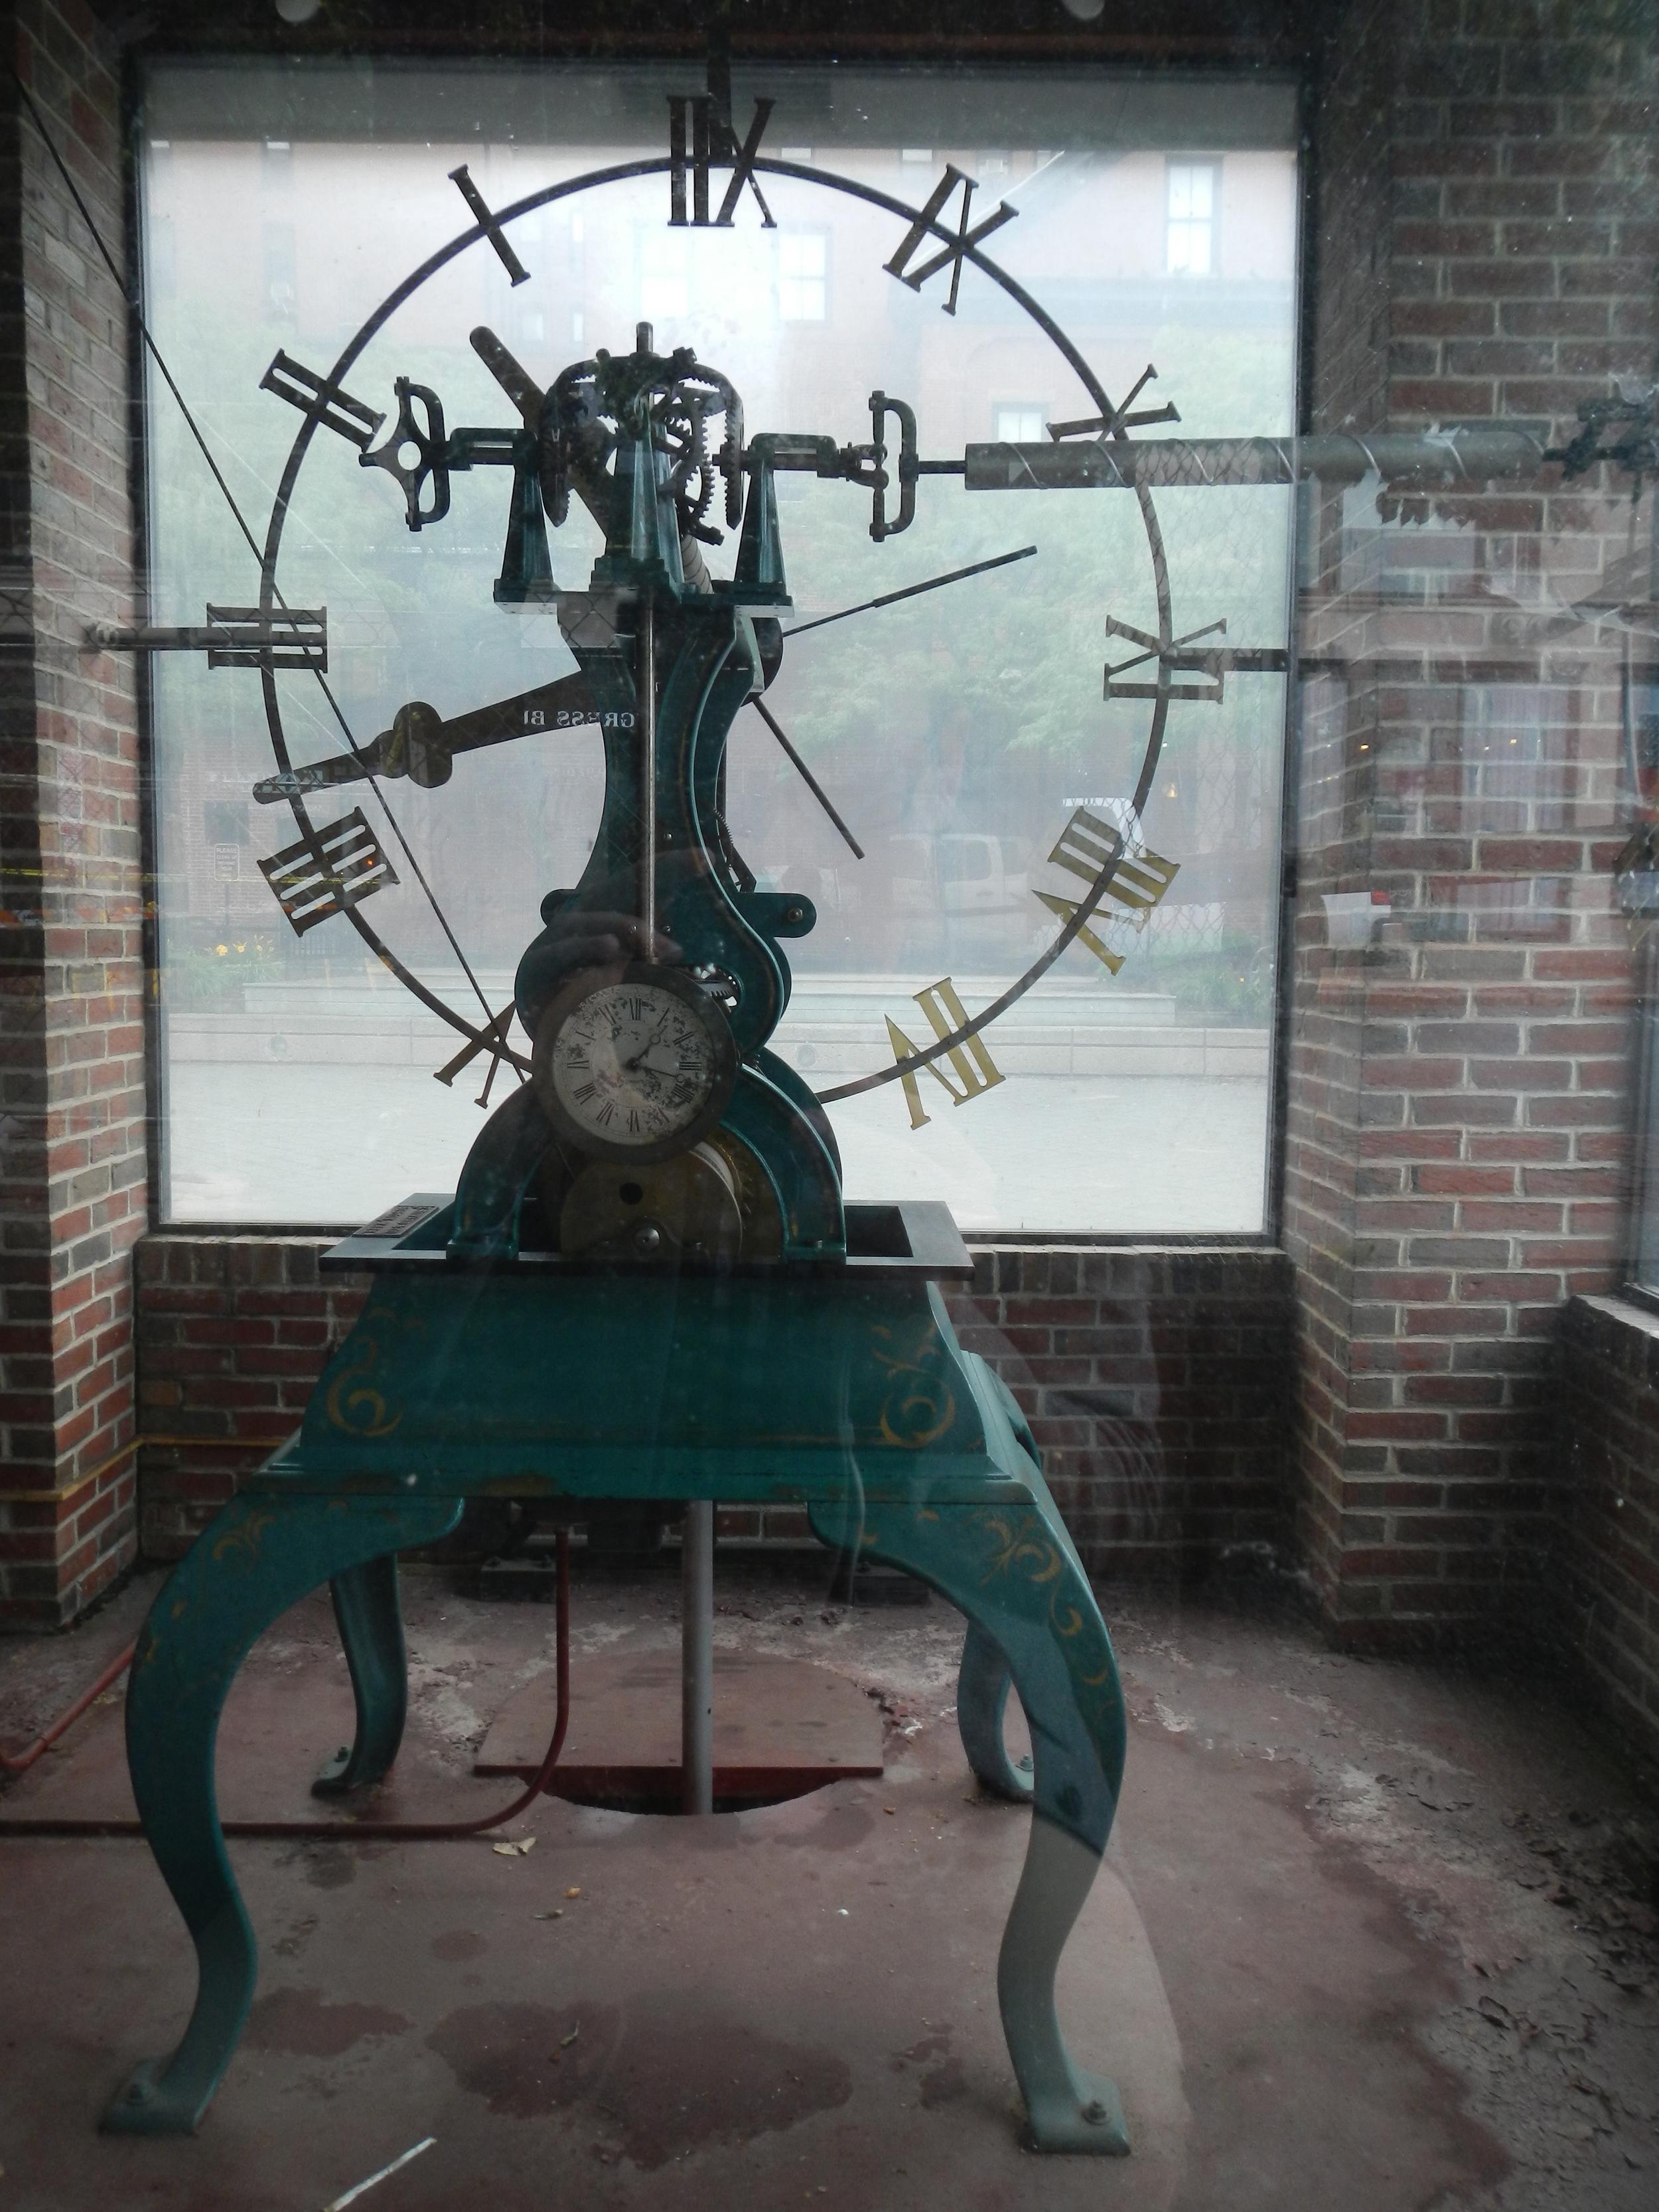 Porltand_Union_Station_Clock_Viewing_Clock_2013.JPG